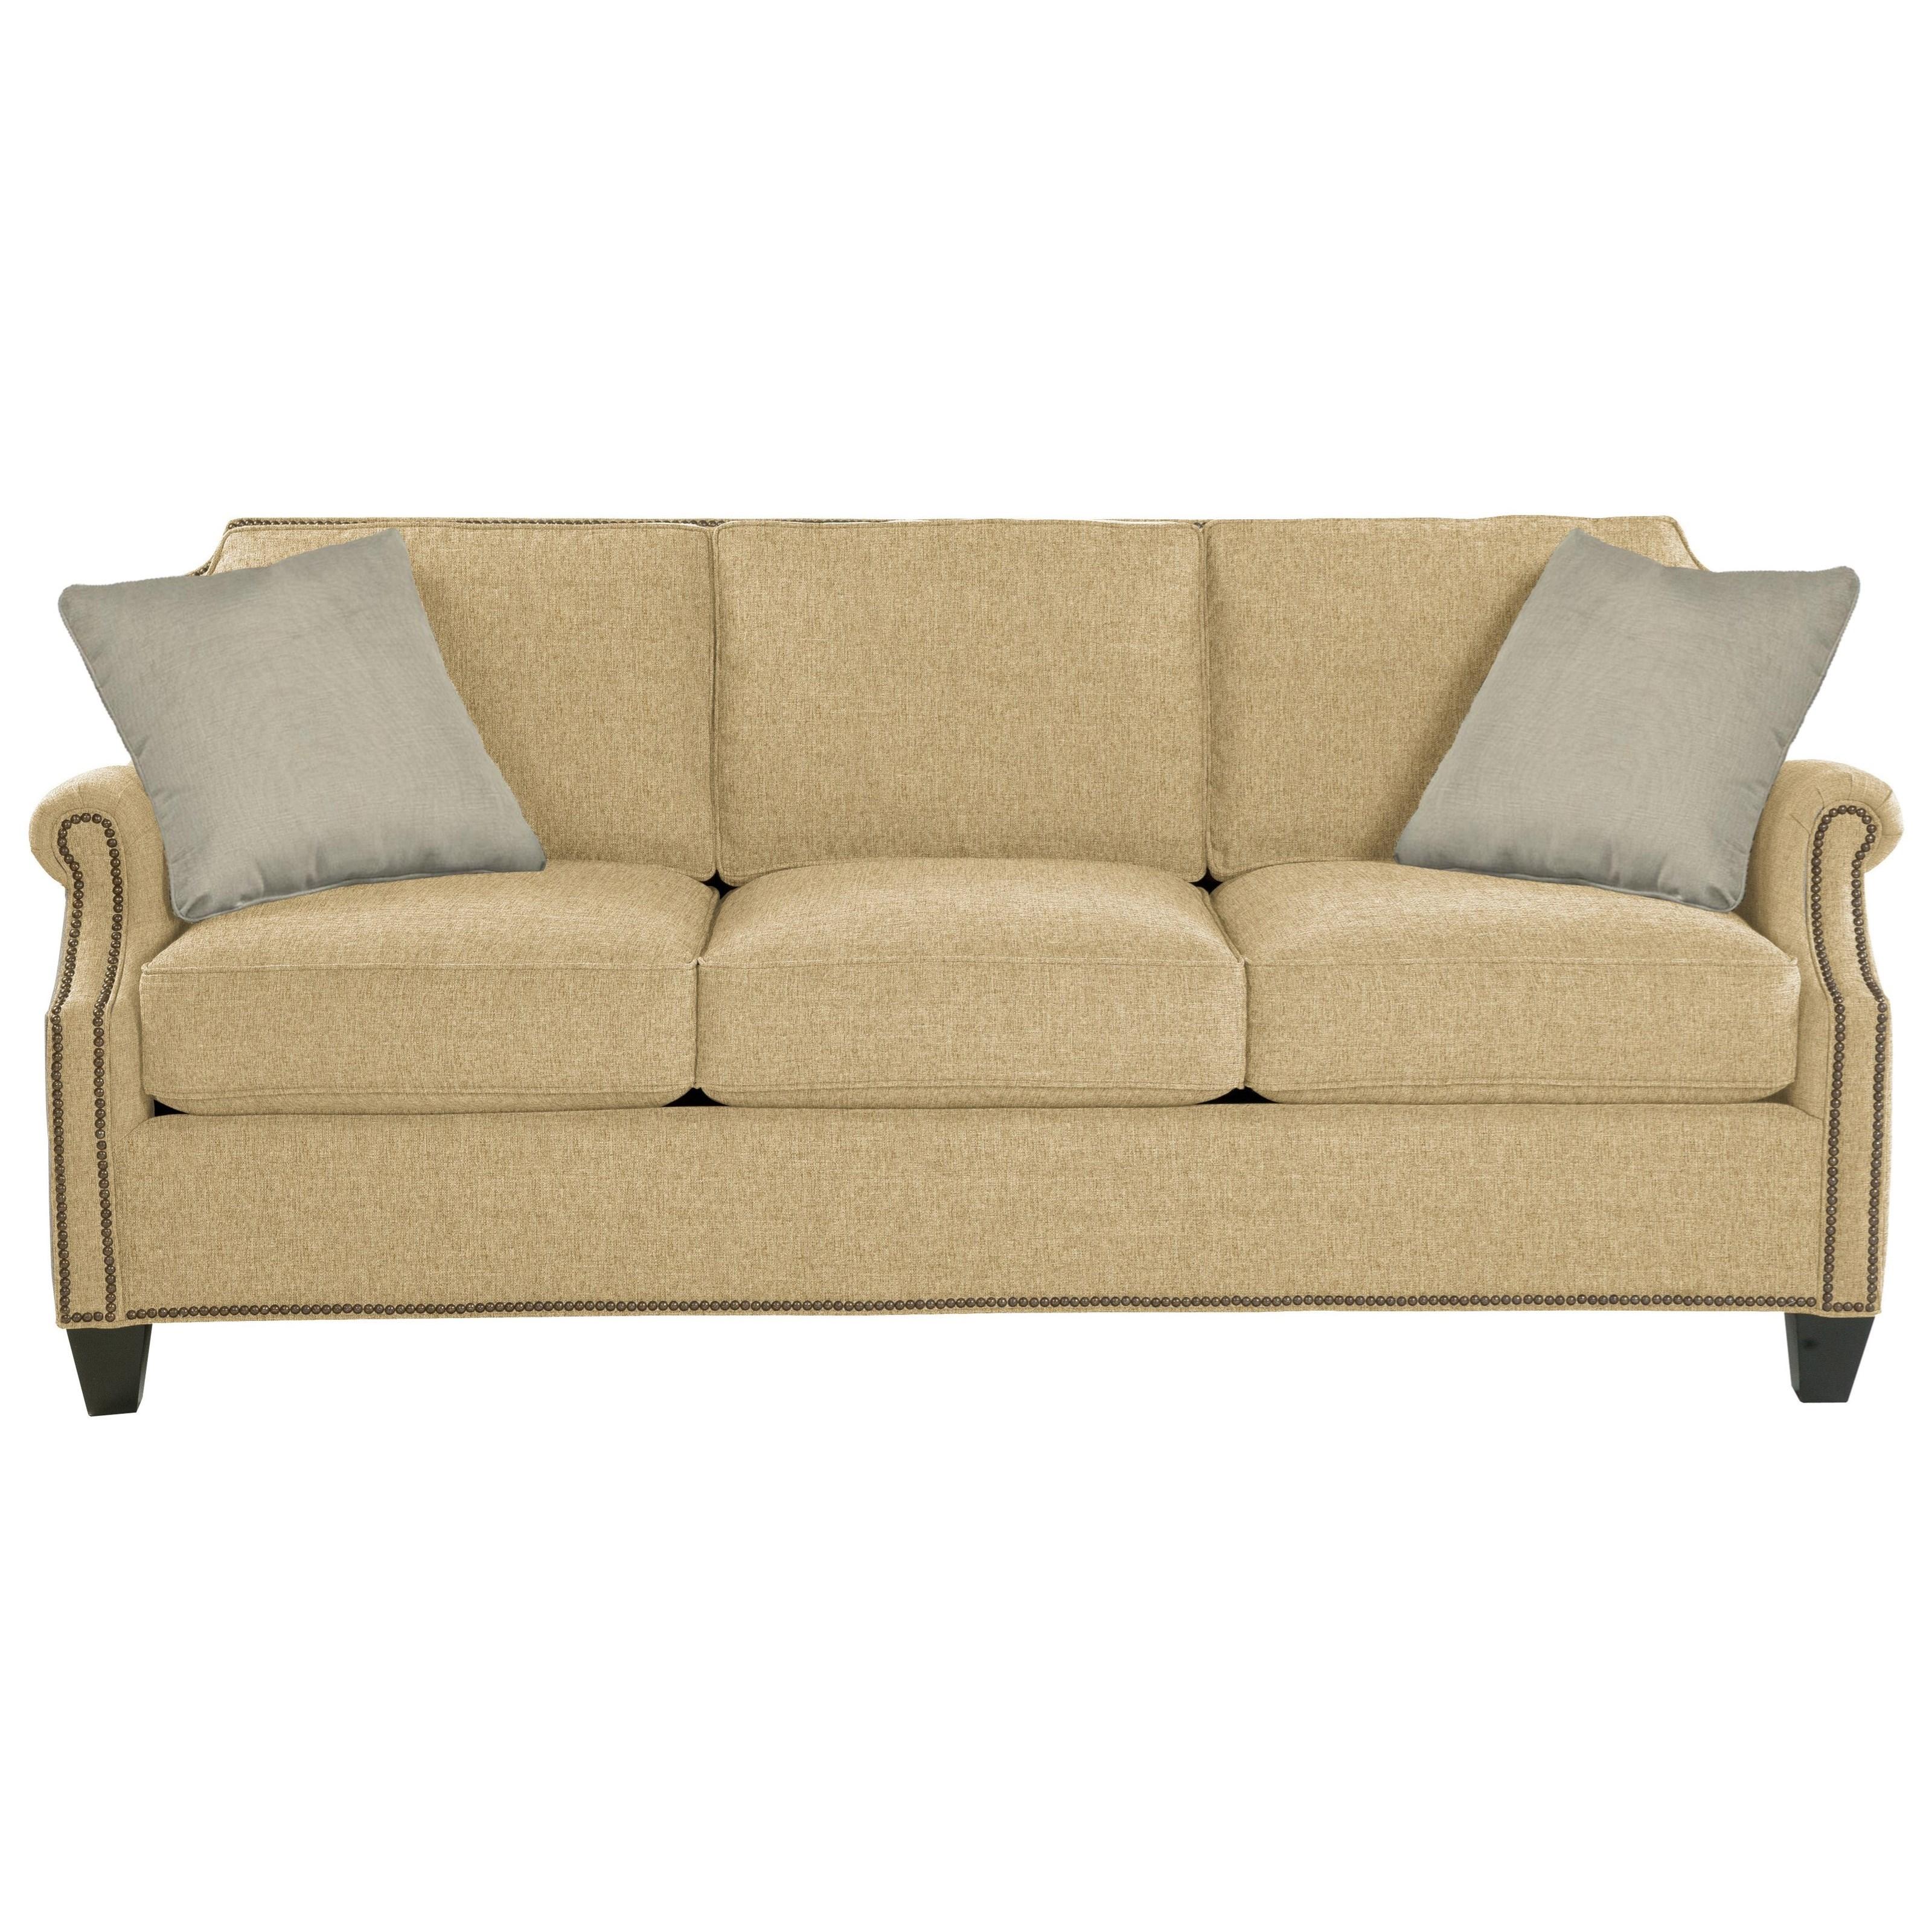 9383 Sofa by Craftmaster at Story & Lee Furniture